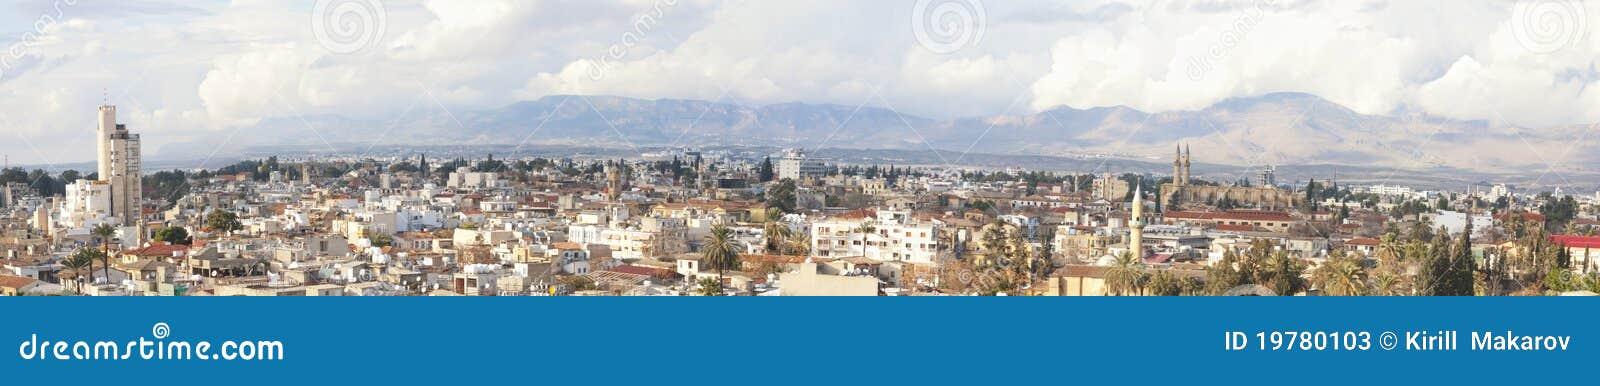 Stadsbild panorama- nicosia